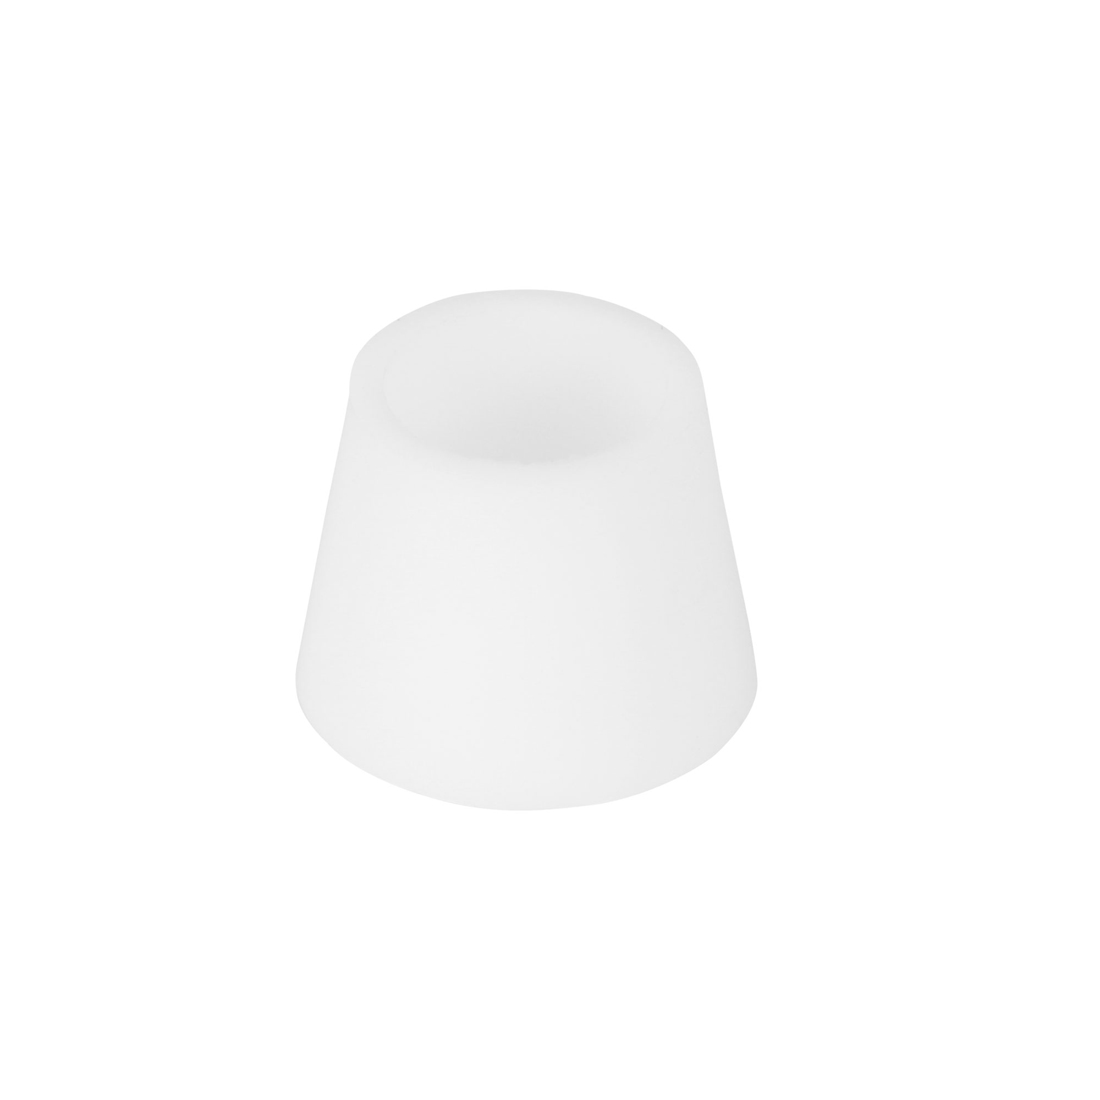 "Leg Caps 10mm/3/8"" Anti Slip Table Feet Cover Floor Protector Avoid Scratch"